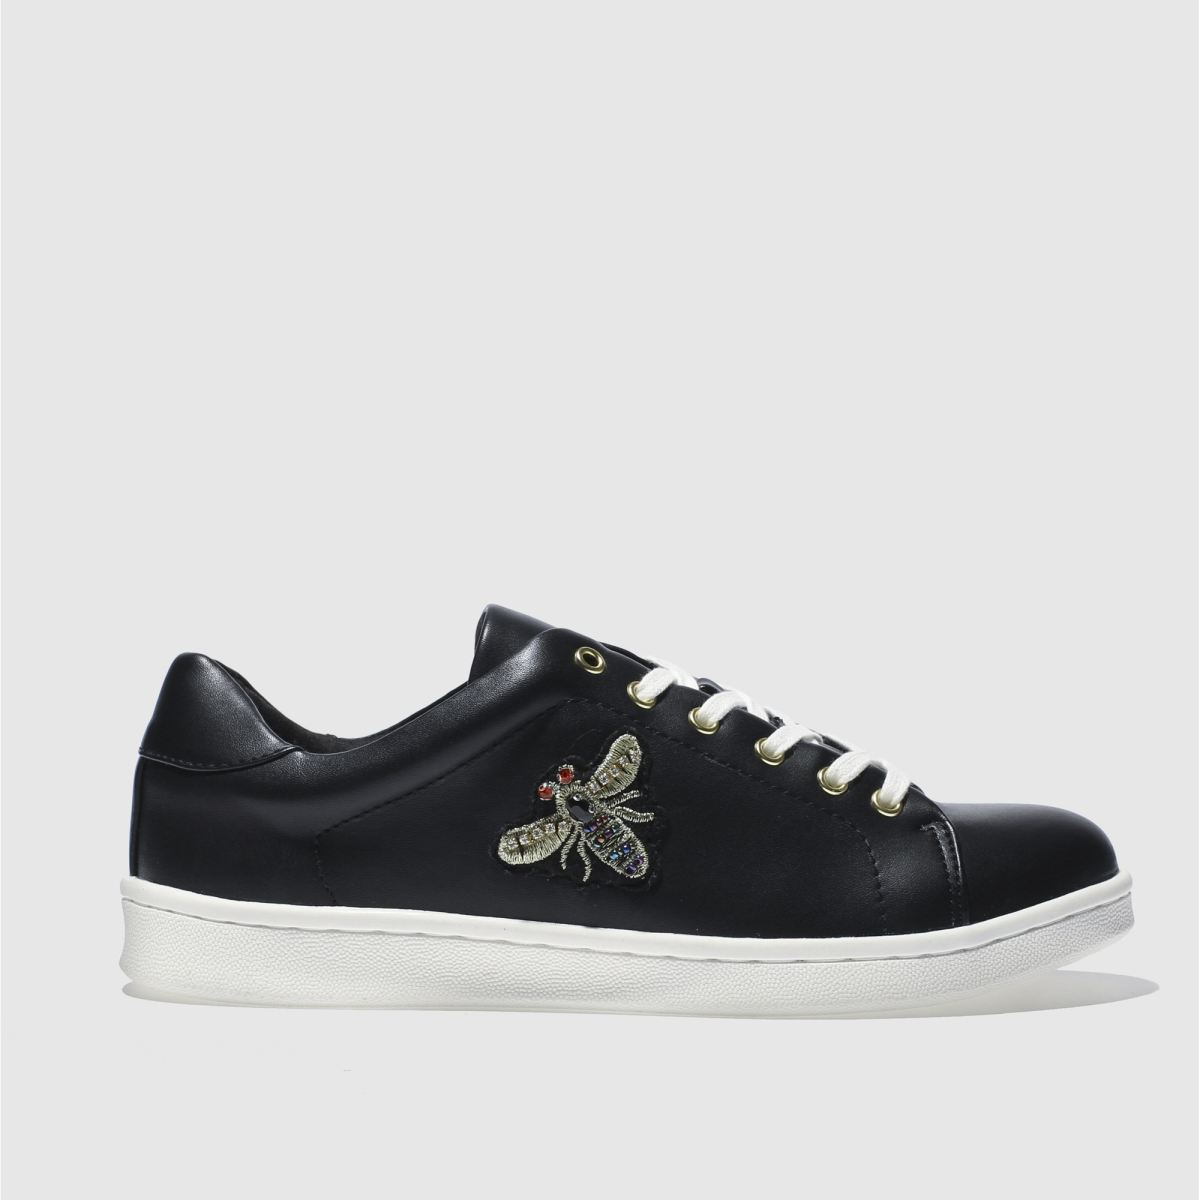 schuh Schuh Black Trapeze Bee Flat Shoes